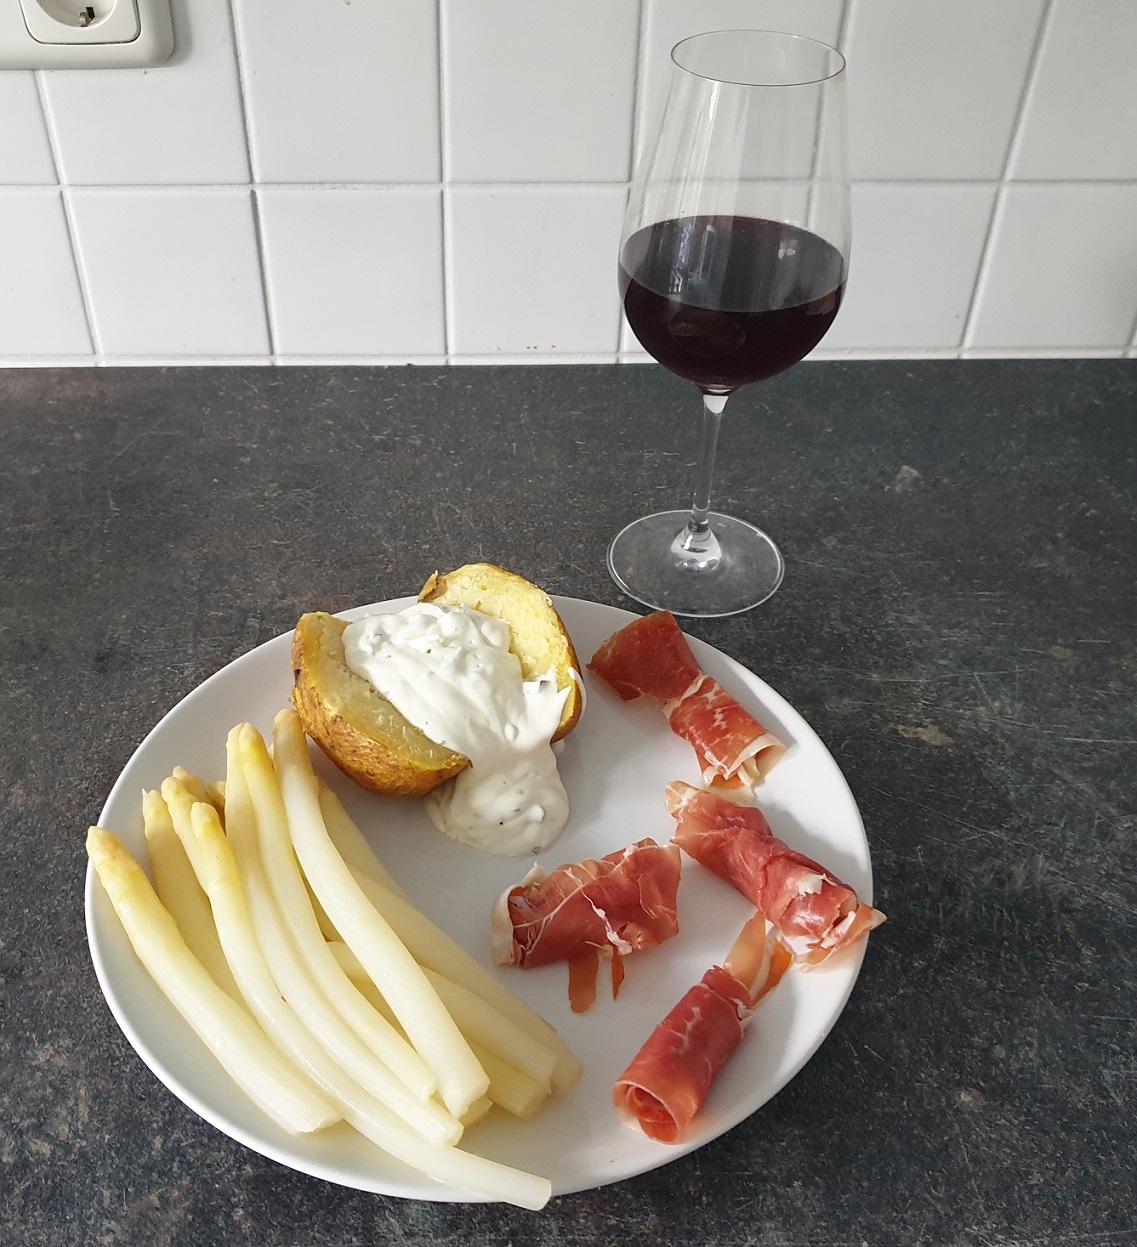 https://foodloader.net/DeepBlueSea_2020-06-26_Spargel_und_Wein.jpg